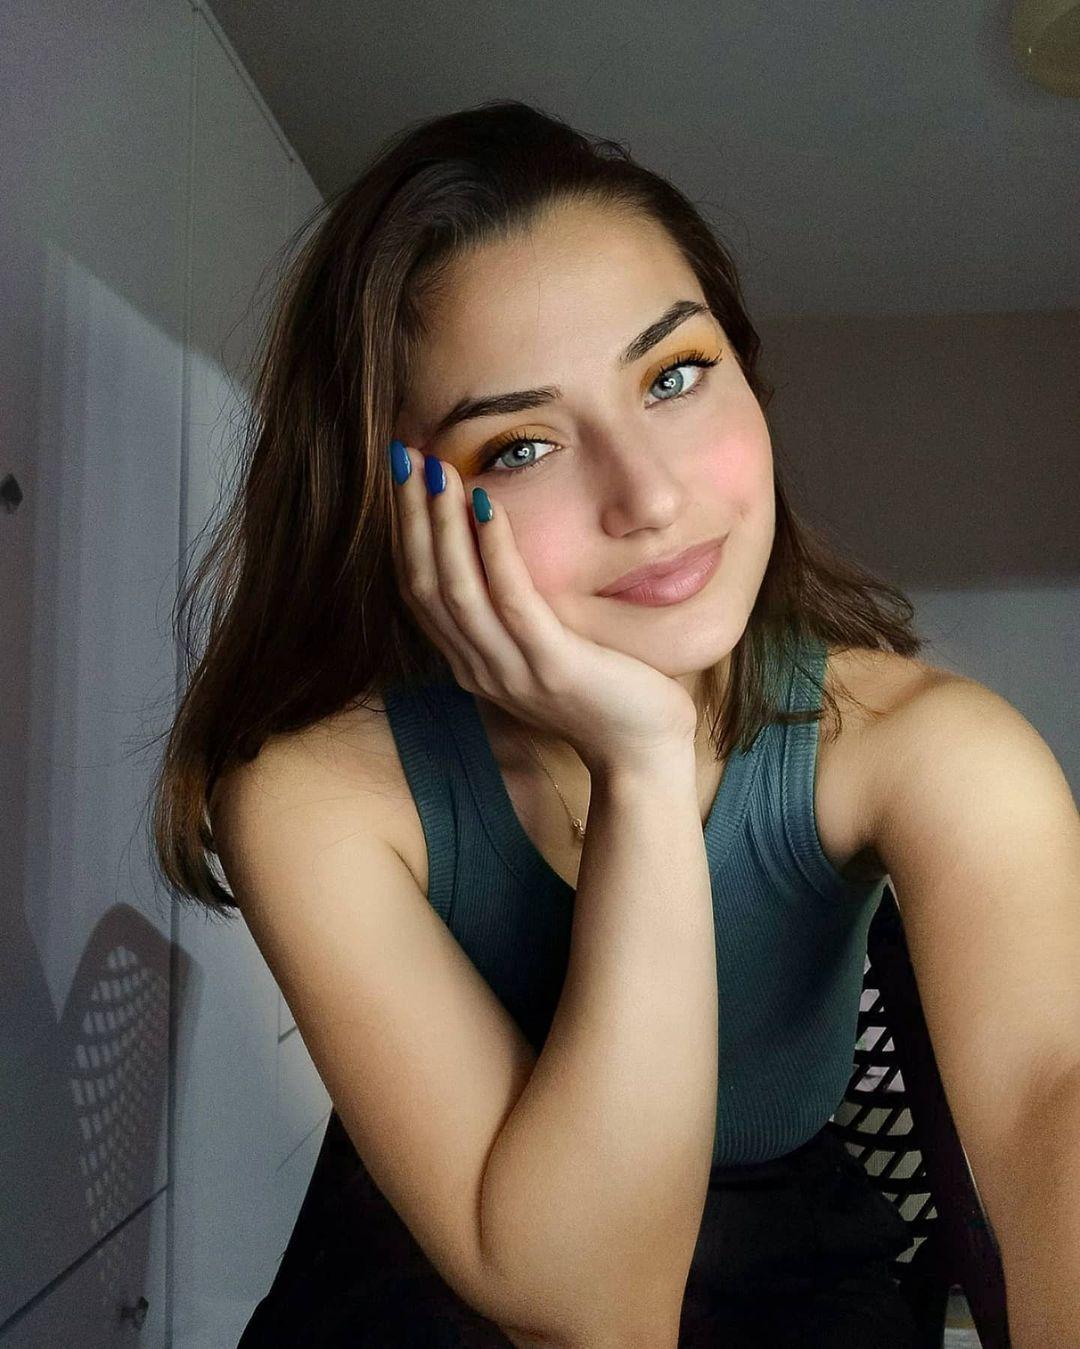 Aleyna-Bagdacicek-Wallpapers-insta-Fit-Bio-2